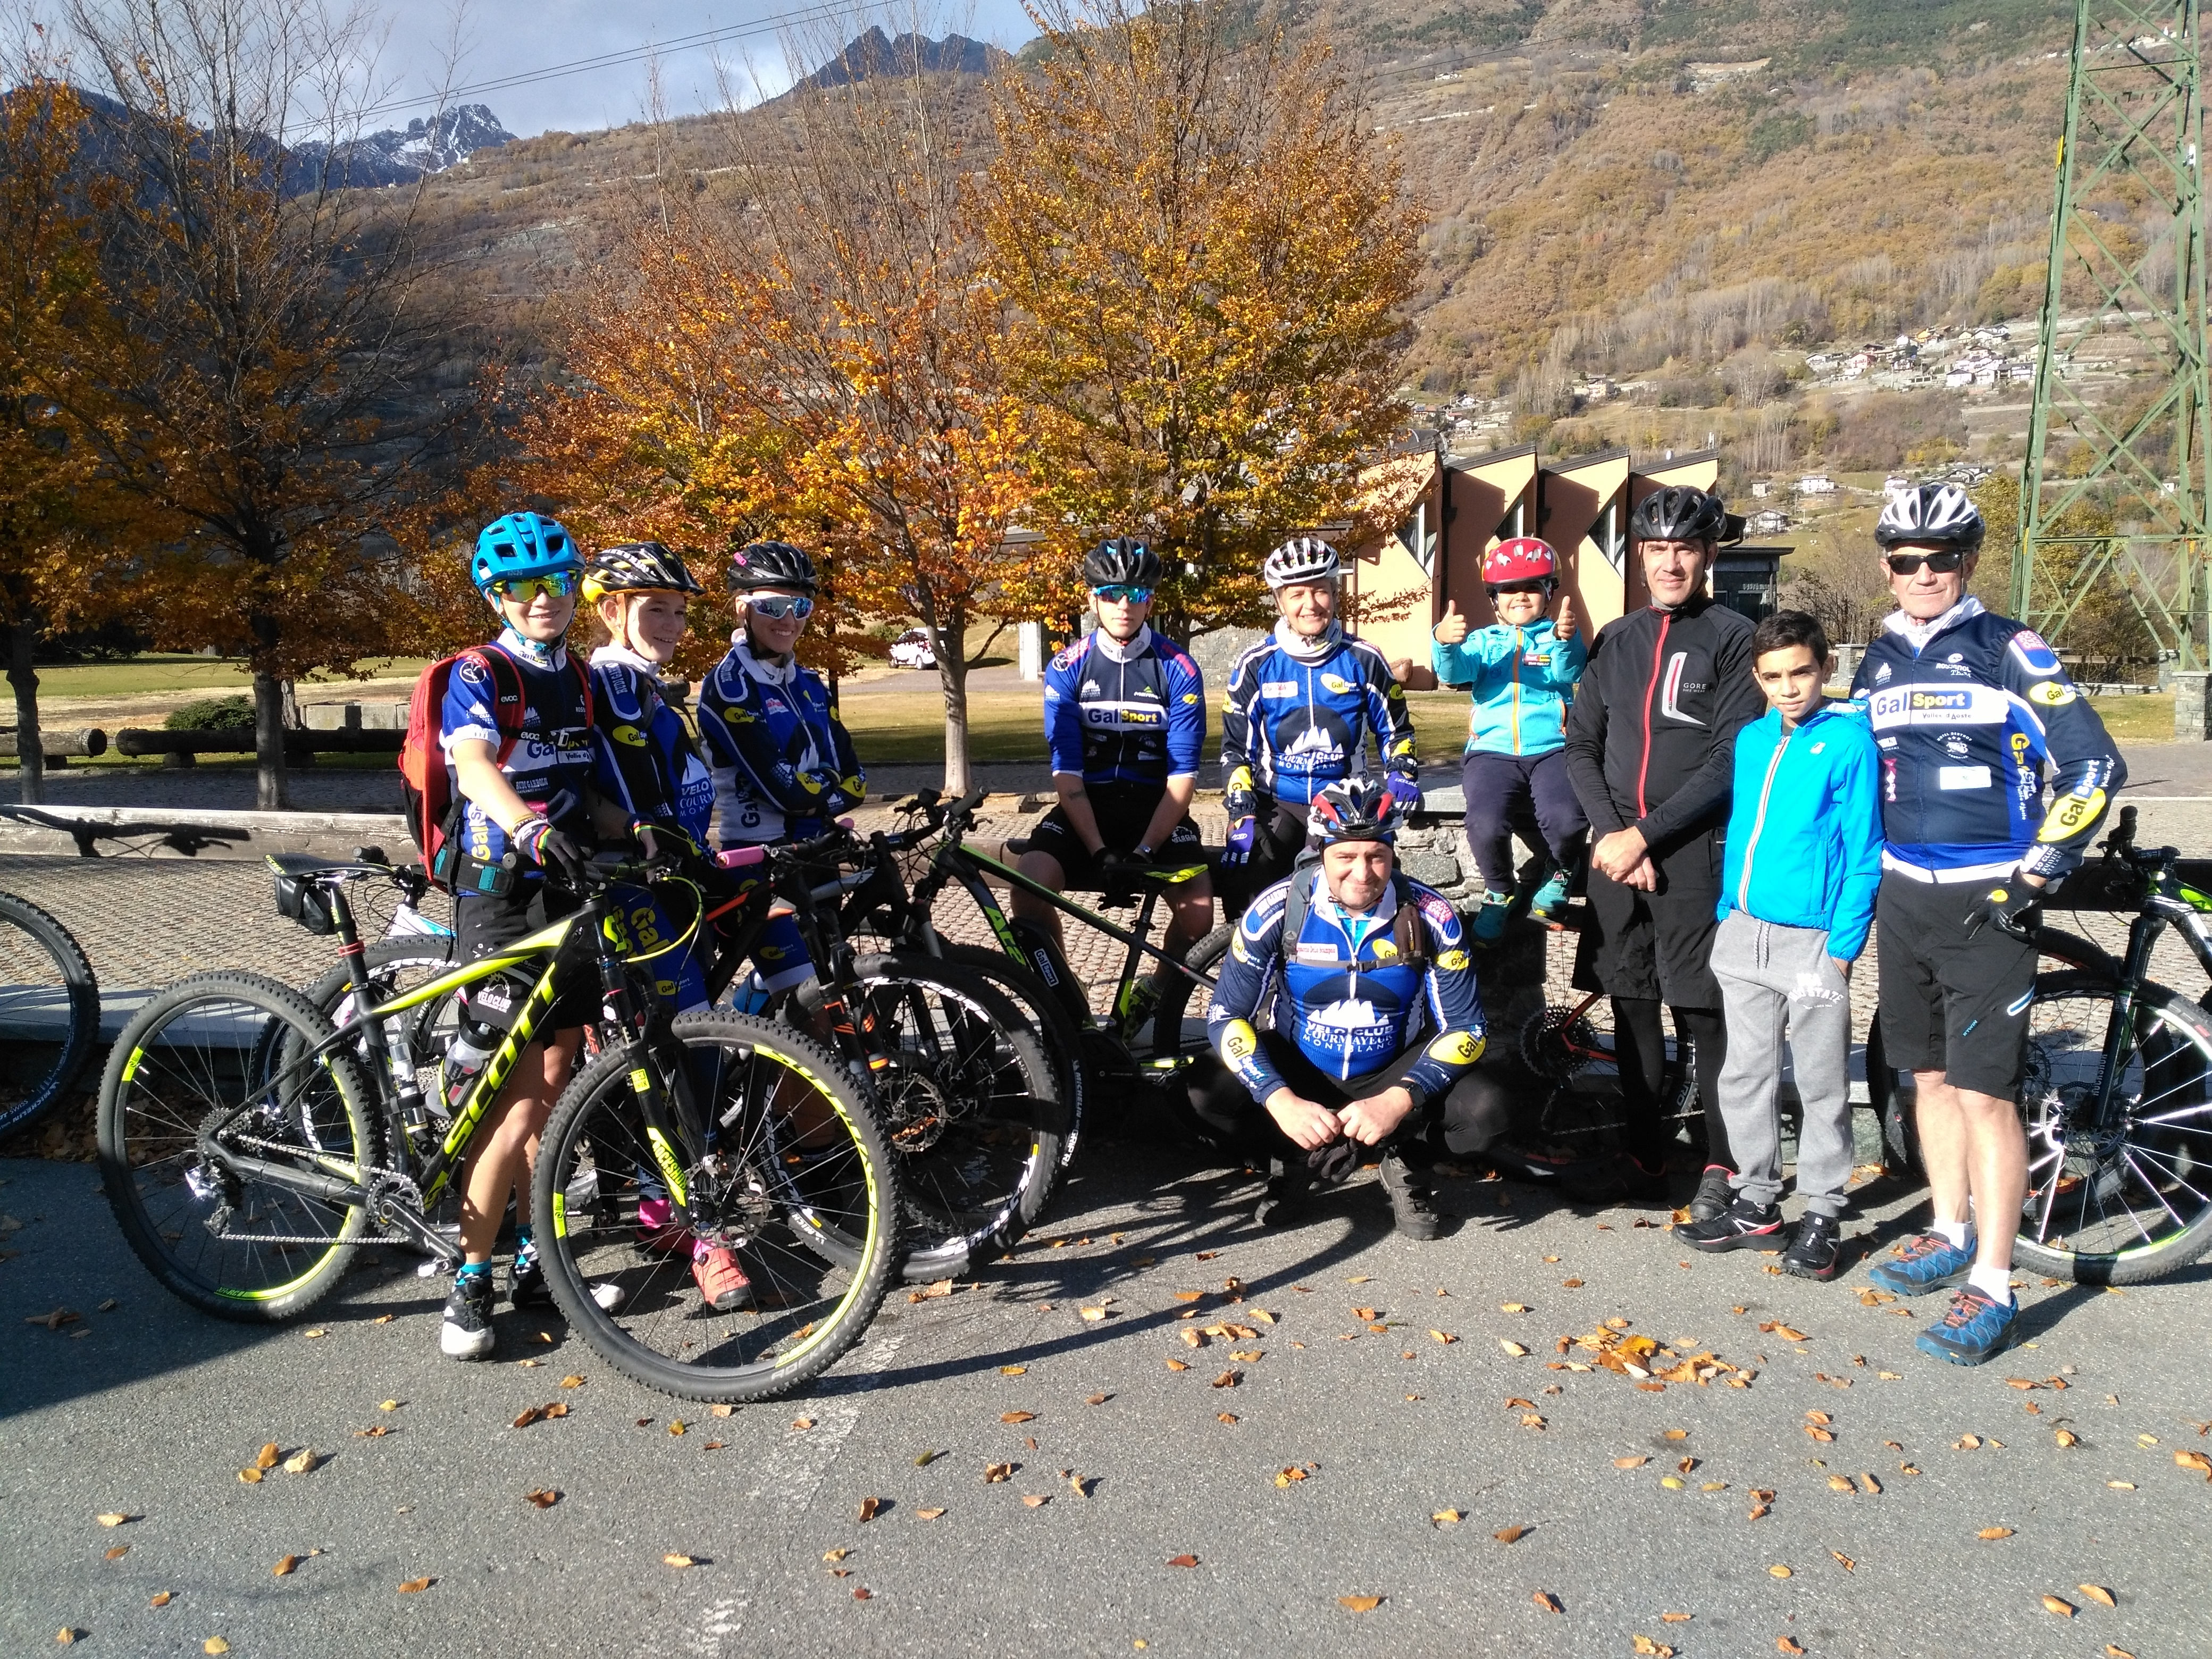 ASD Velo Club Courmayeur Mont Blanc, affiliato Federazione Ciclistica Italiana, Mountain Bike, MTB, Courmayeur, Aosta